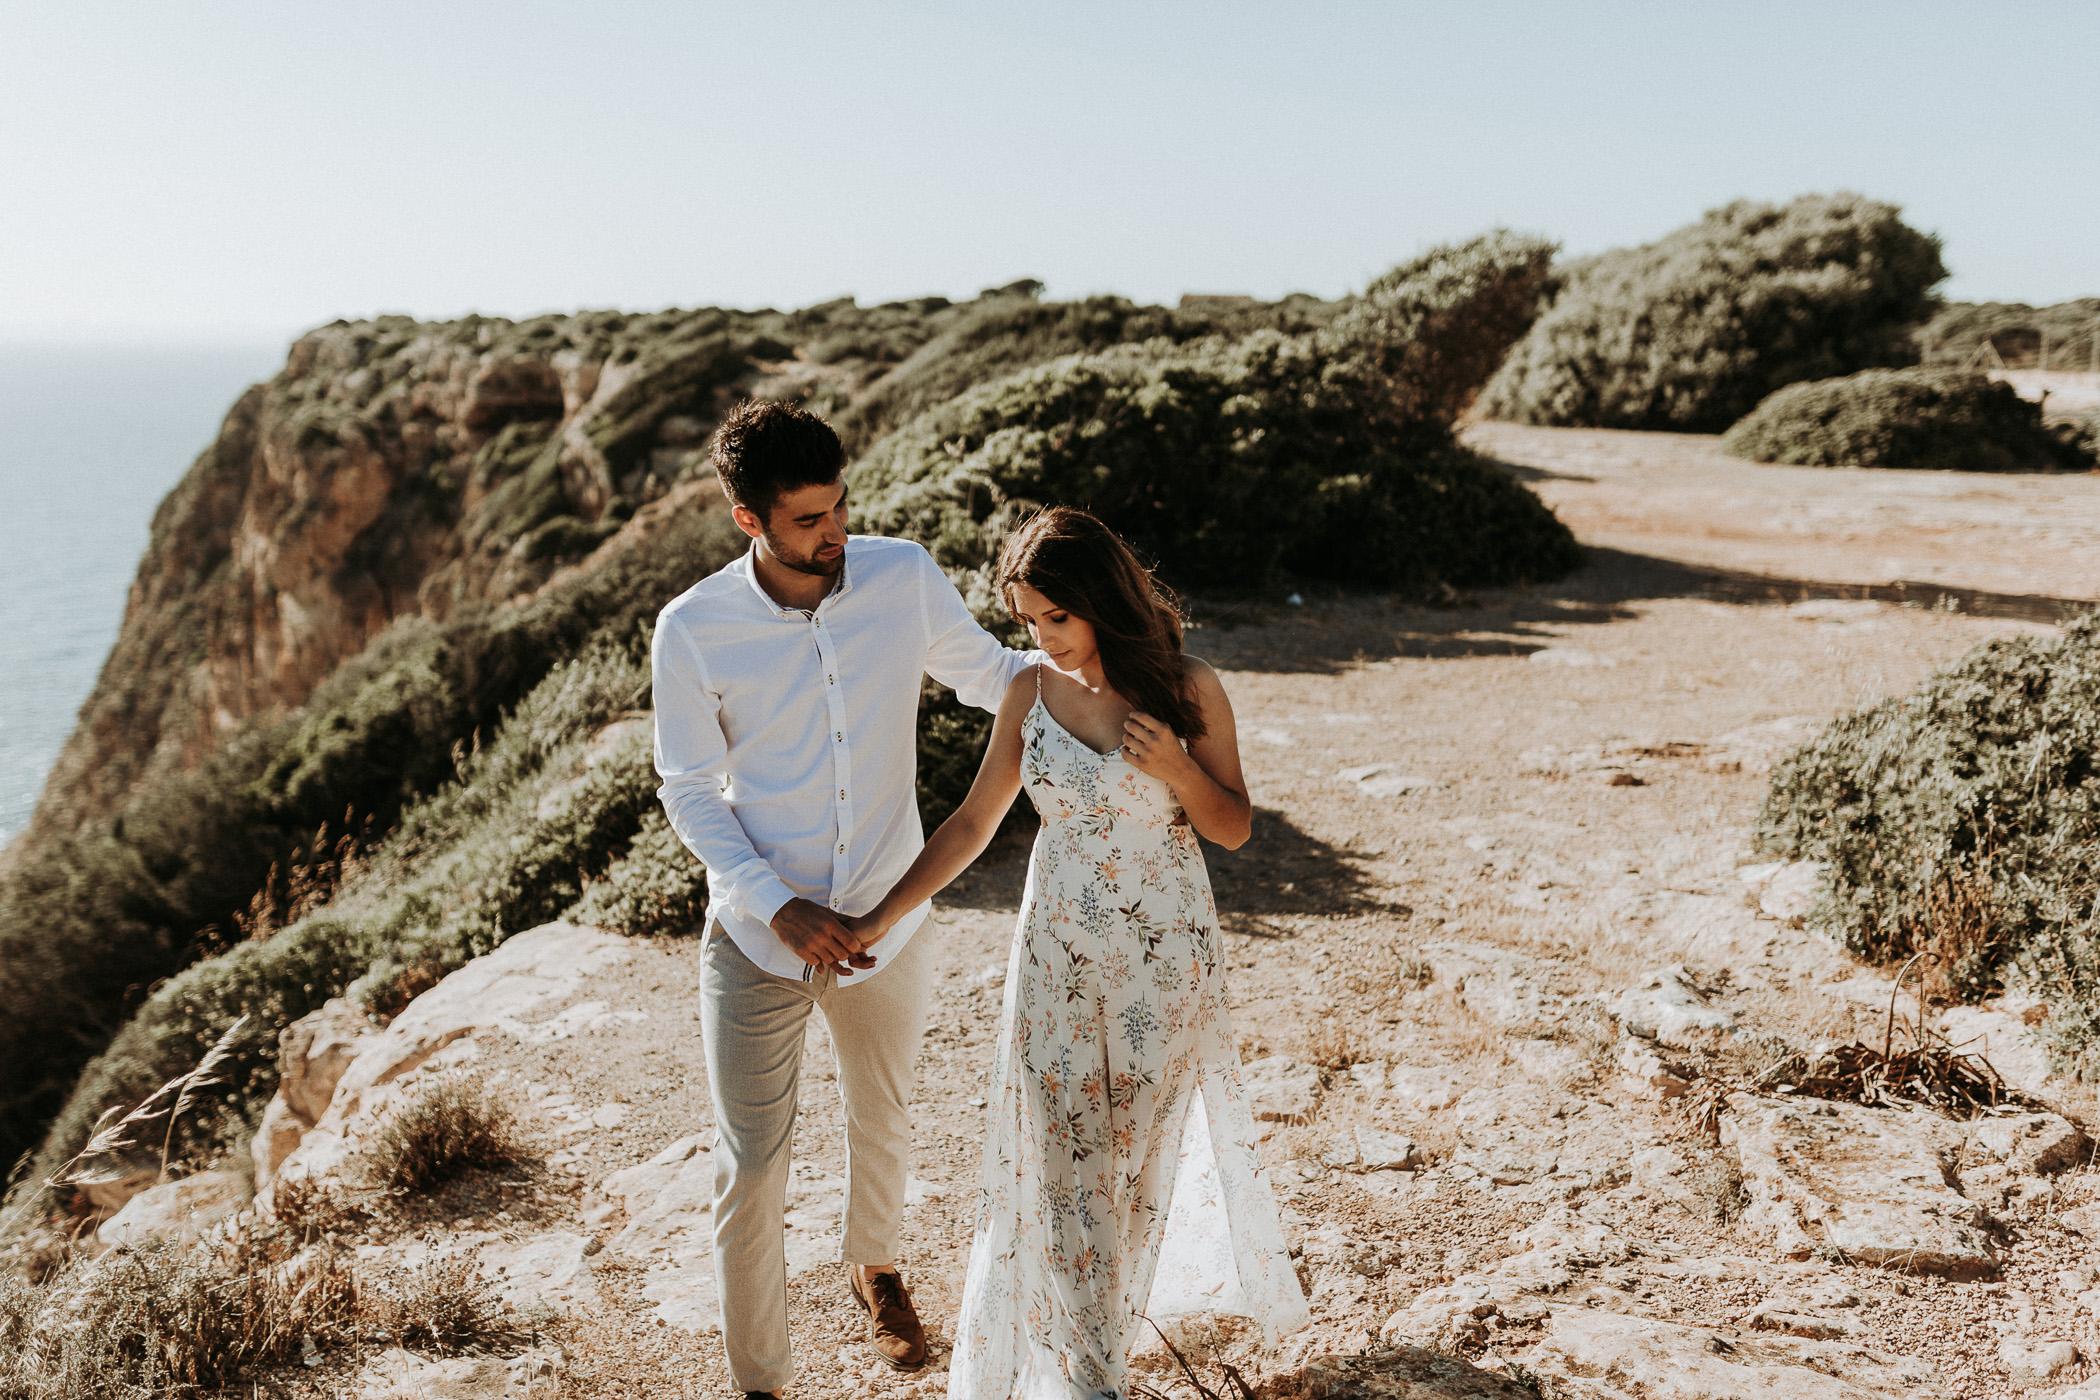 DanielaMarquardtPhotography_wedding_elopement_mallorca_spain_calapi_palma_lauraandtoni_100